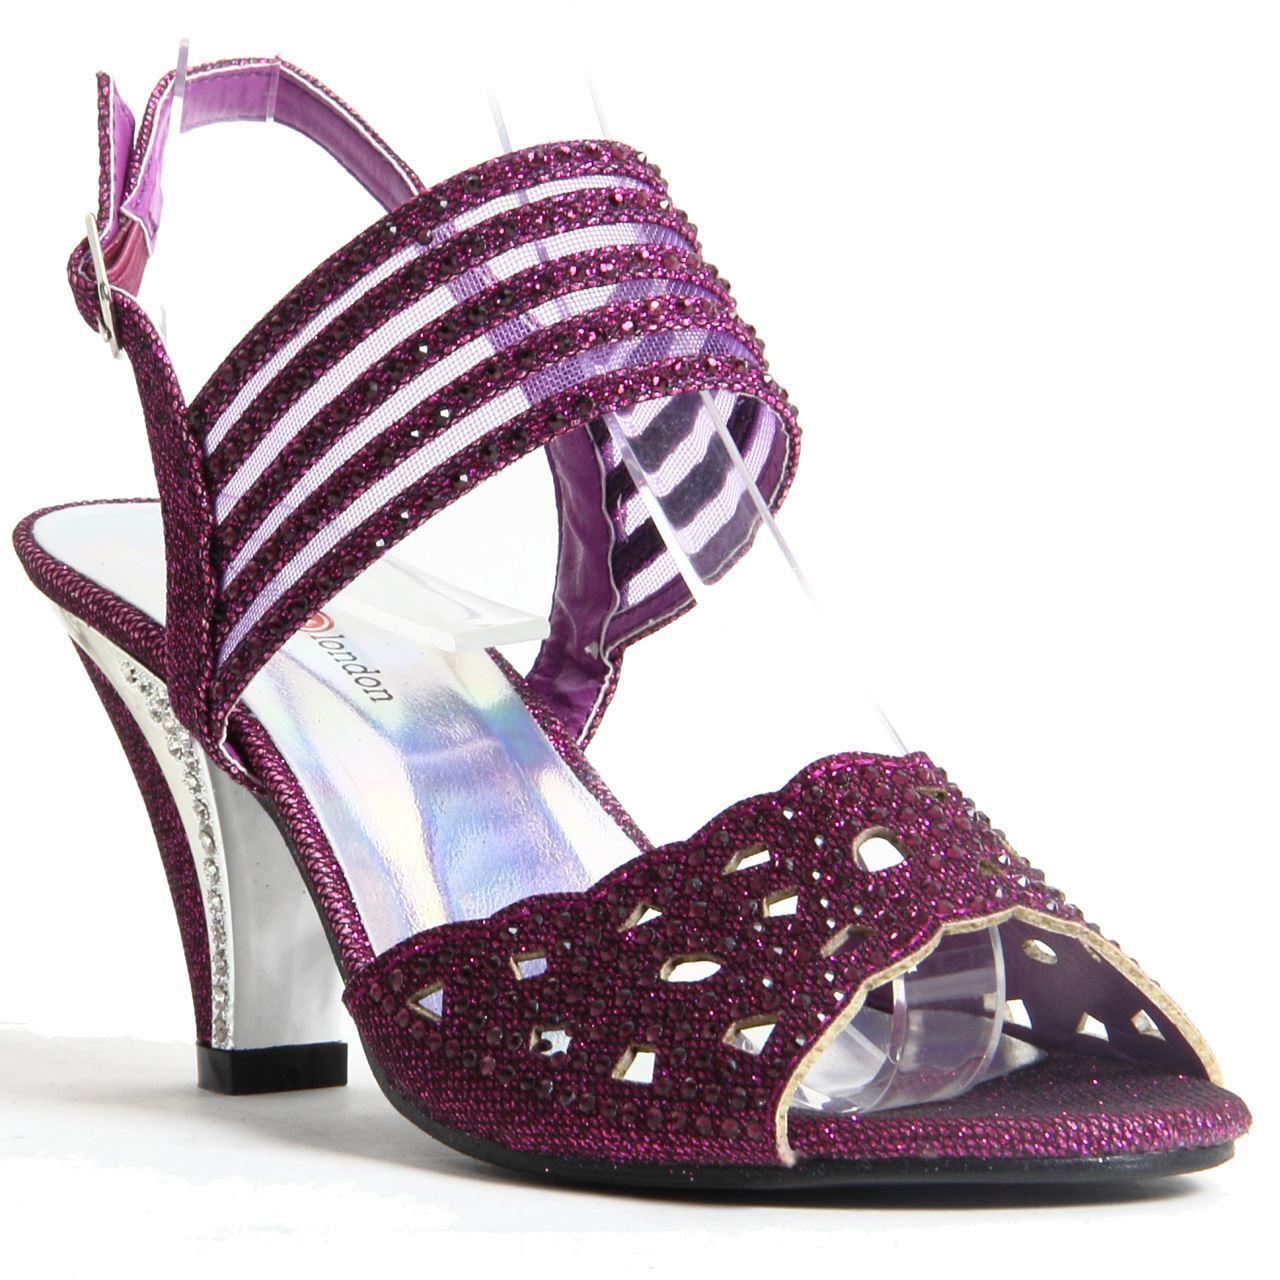 Womens Ladies Sparkling Diamante Block Heel Party Shoes Buckle Up Sandals Purple